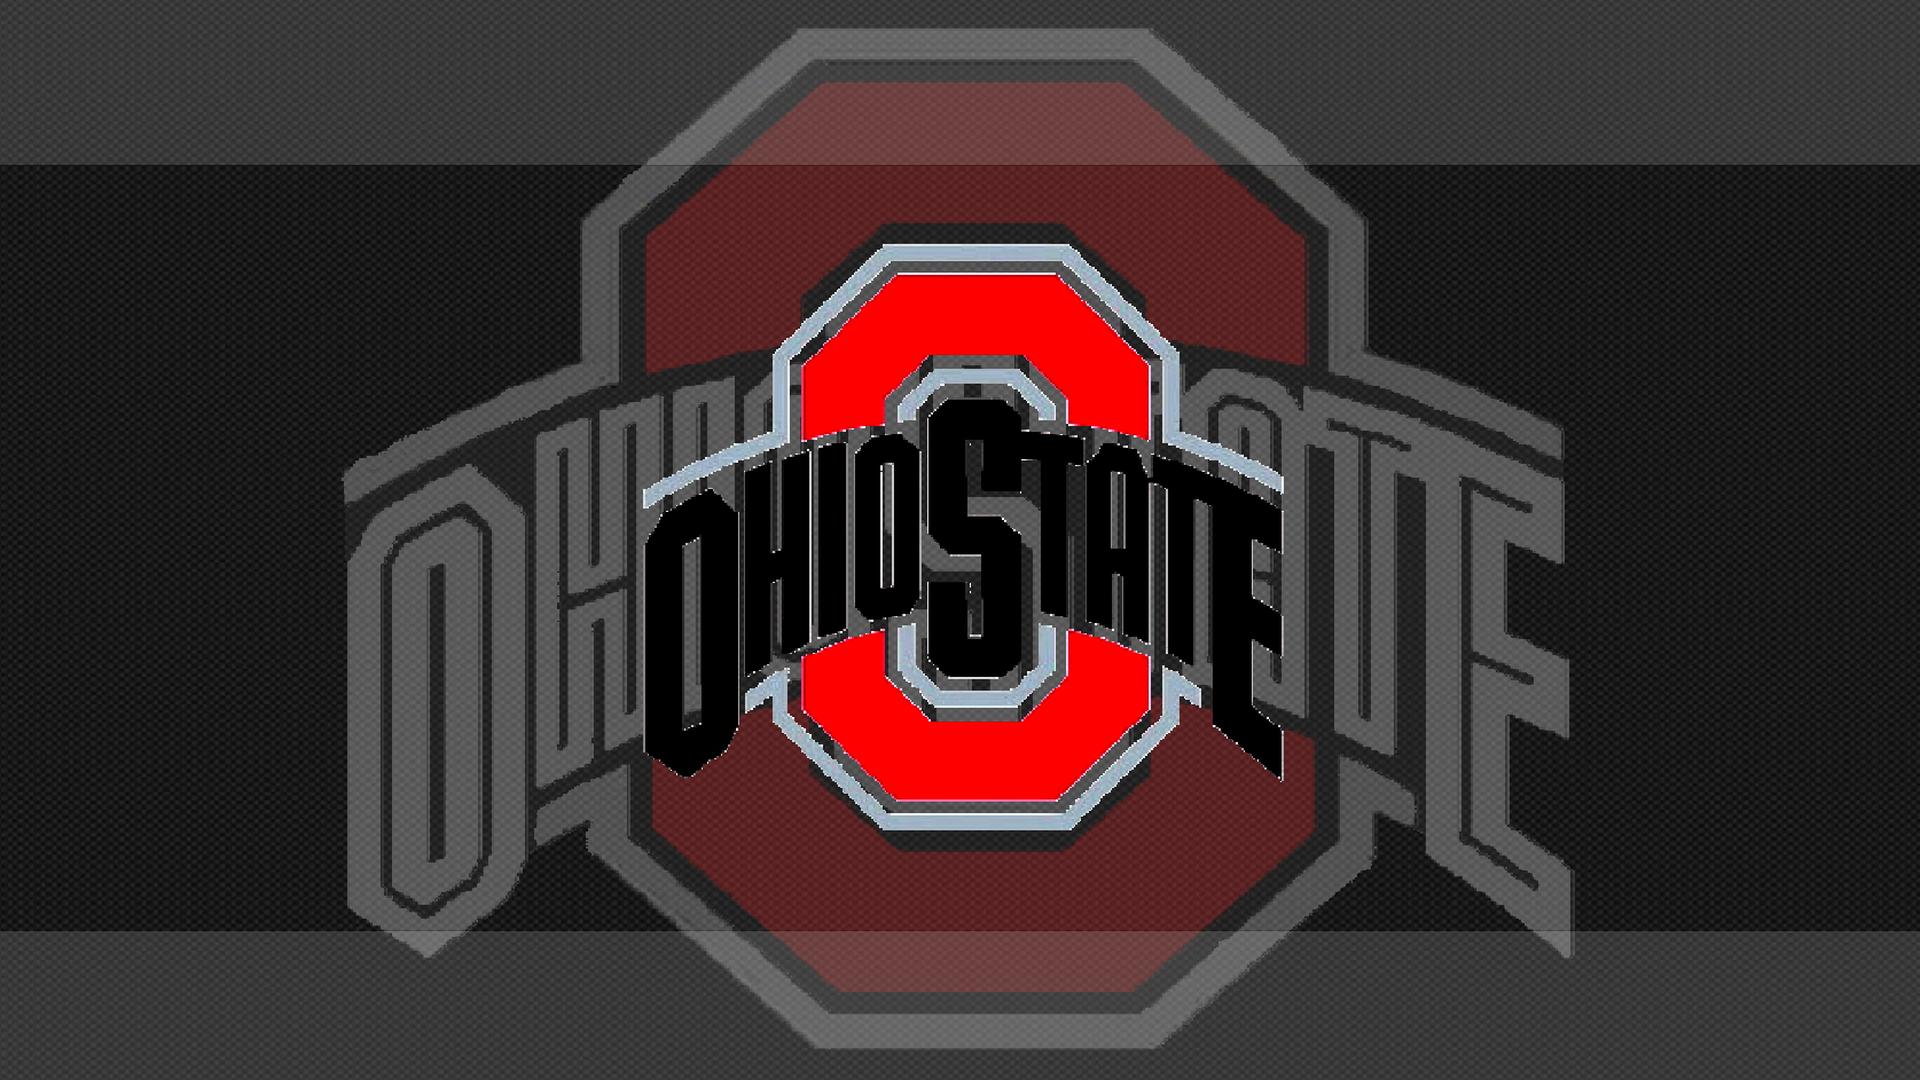 Ohio State Buckeyes images ATHLETIC LOGO #7 wallpaper photos (33724196 ...